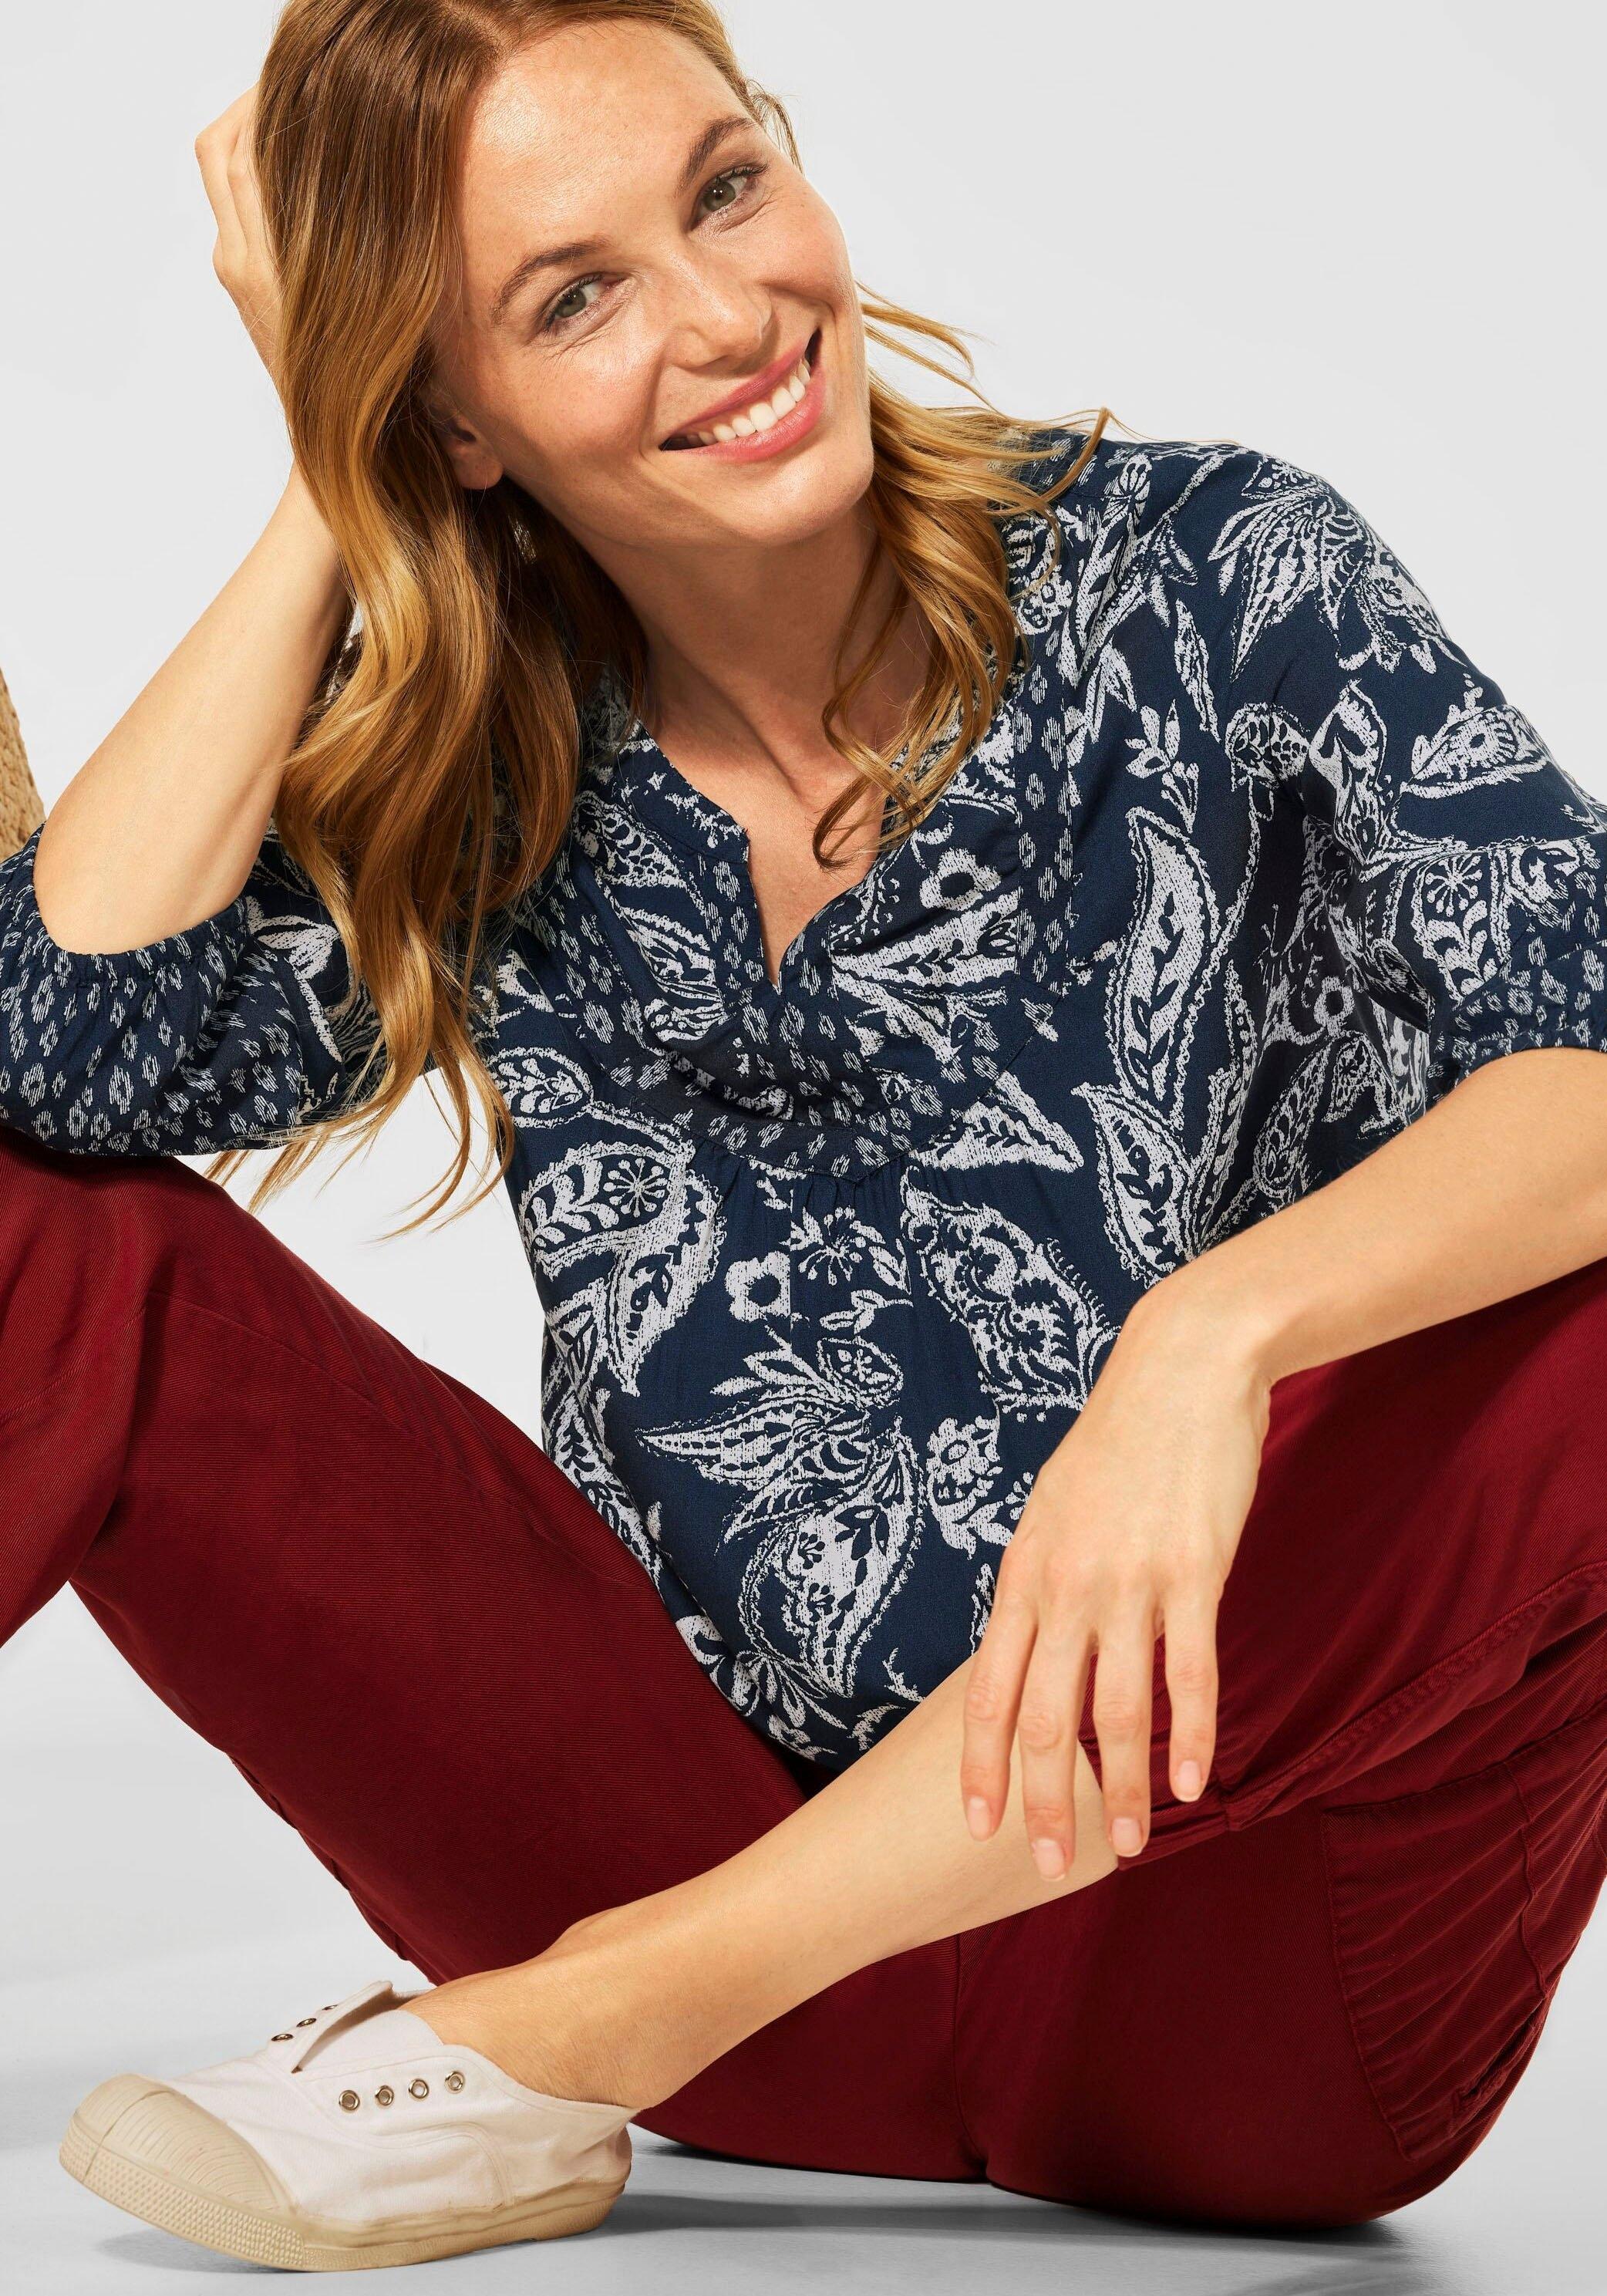 Cecil Gedessineerde blouse voordelig en veilig online kopen